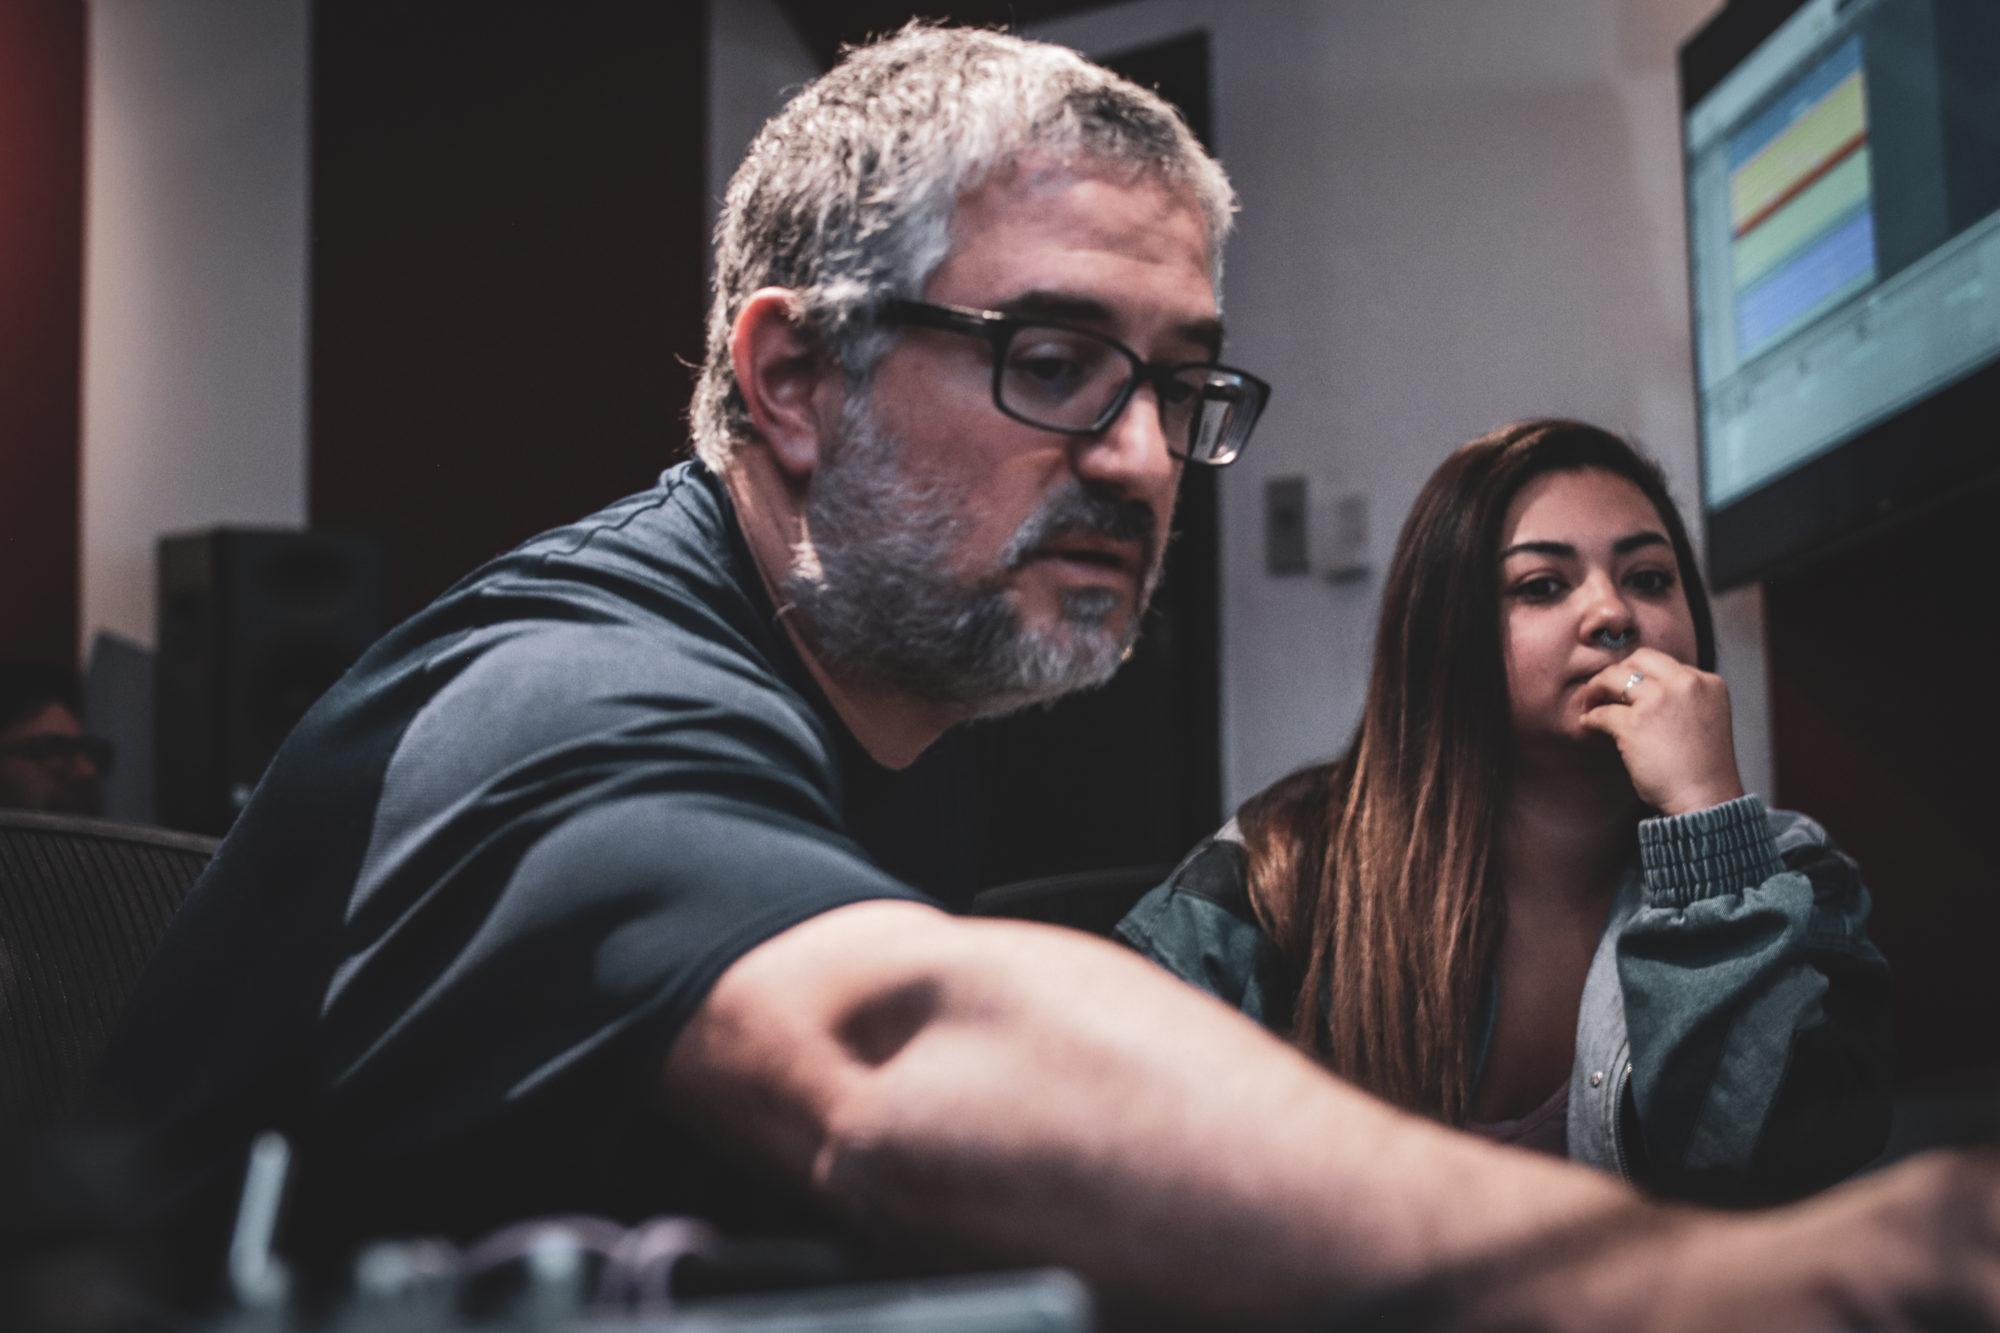 Matt Donner and Student in Studio B at Pyramind